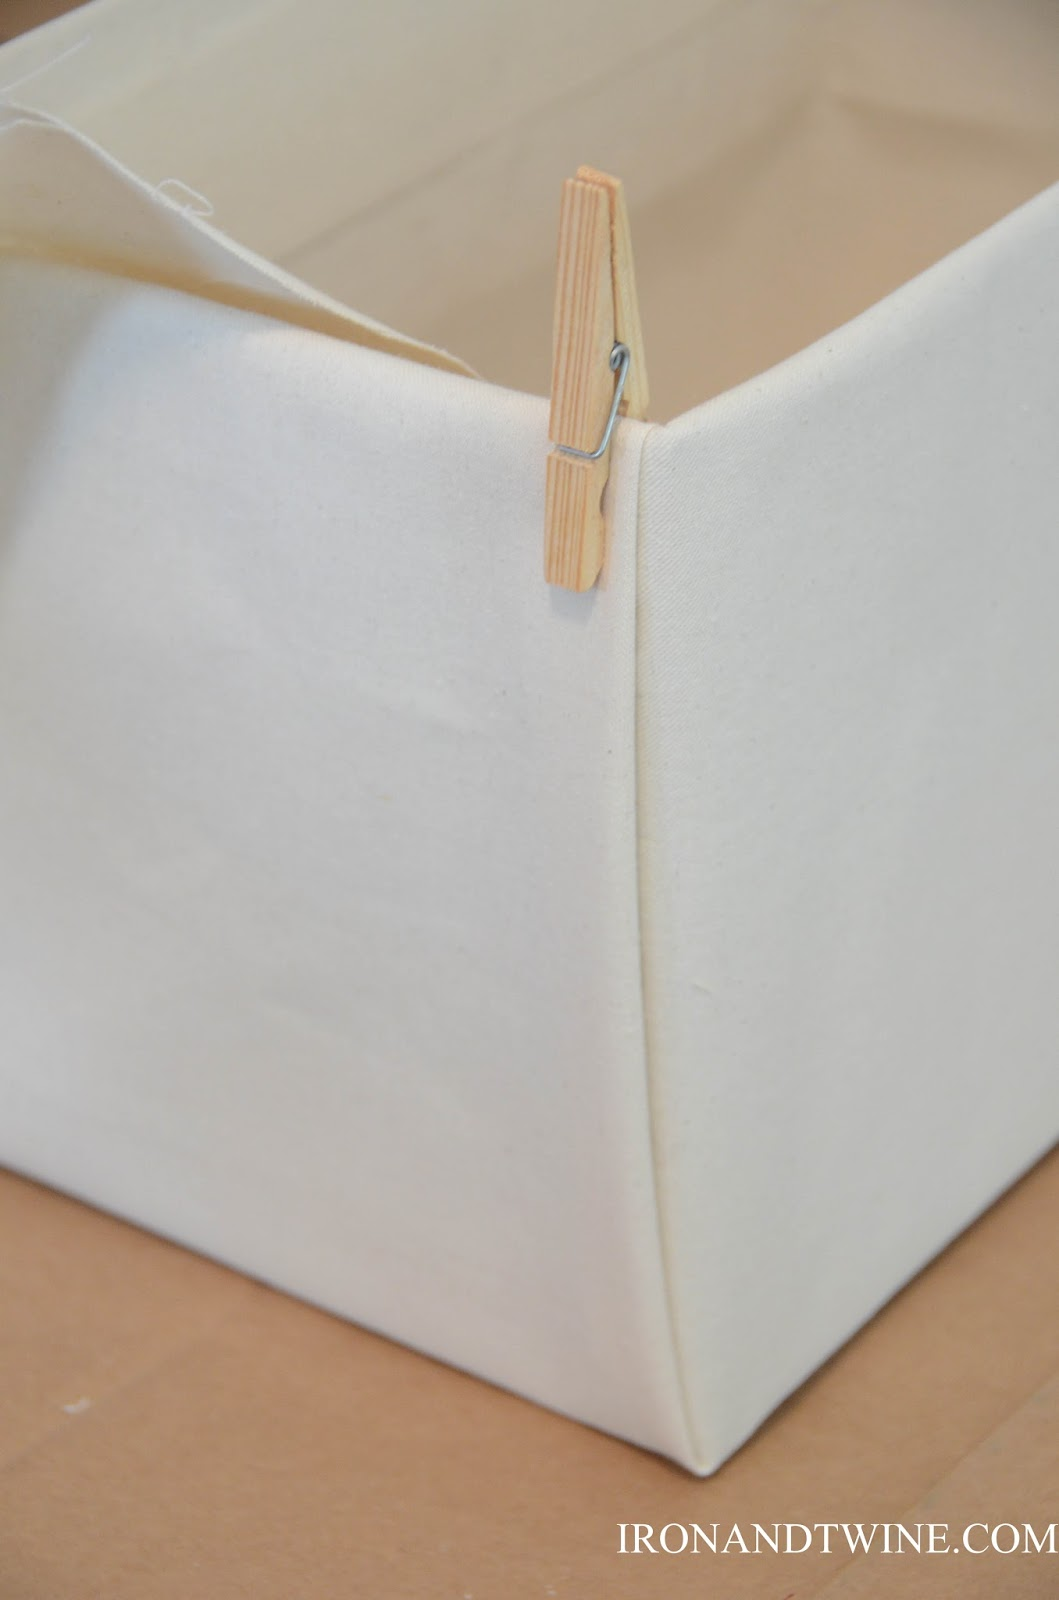 DIY+Belt+Handled+Box,+DIY+fabric+covered+box,+Iron+and+Twine+(29).jpg